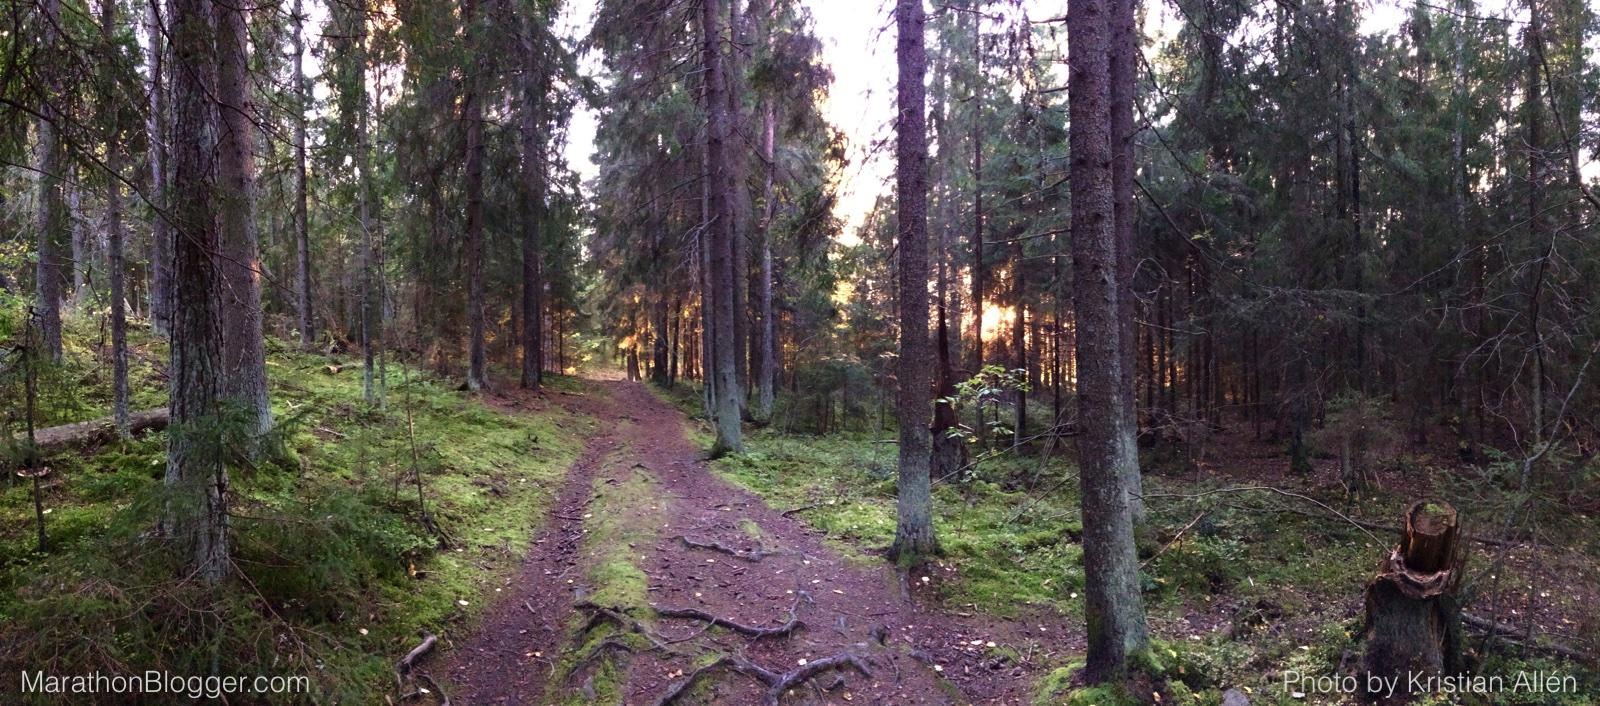 29.9.2015 21.10 km Run